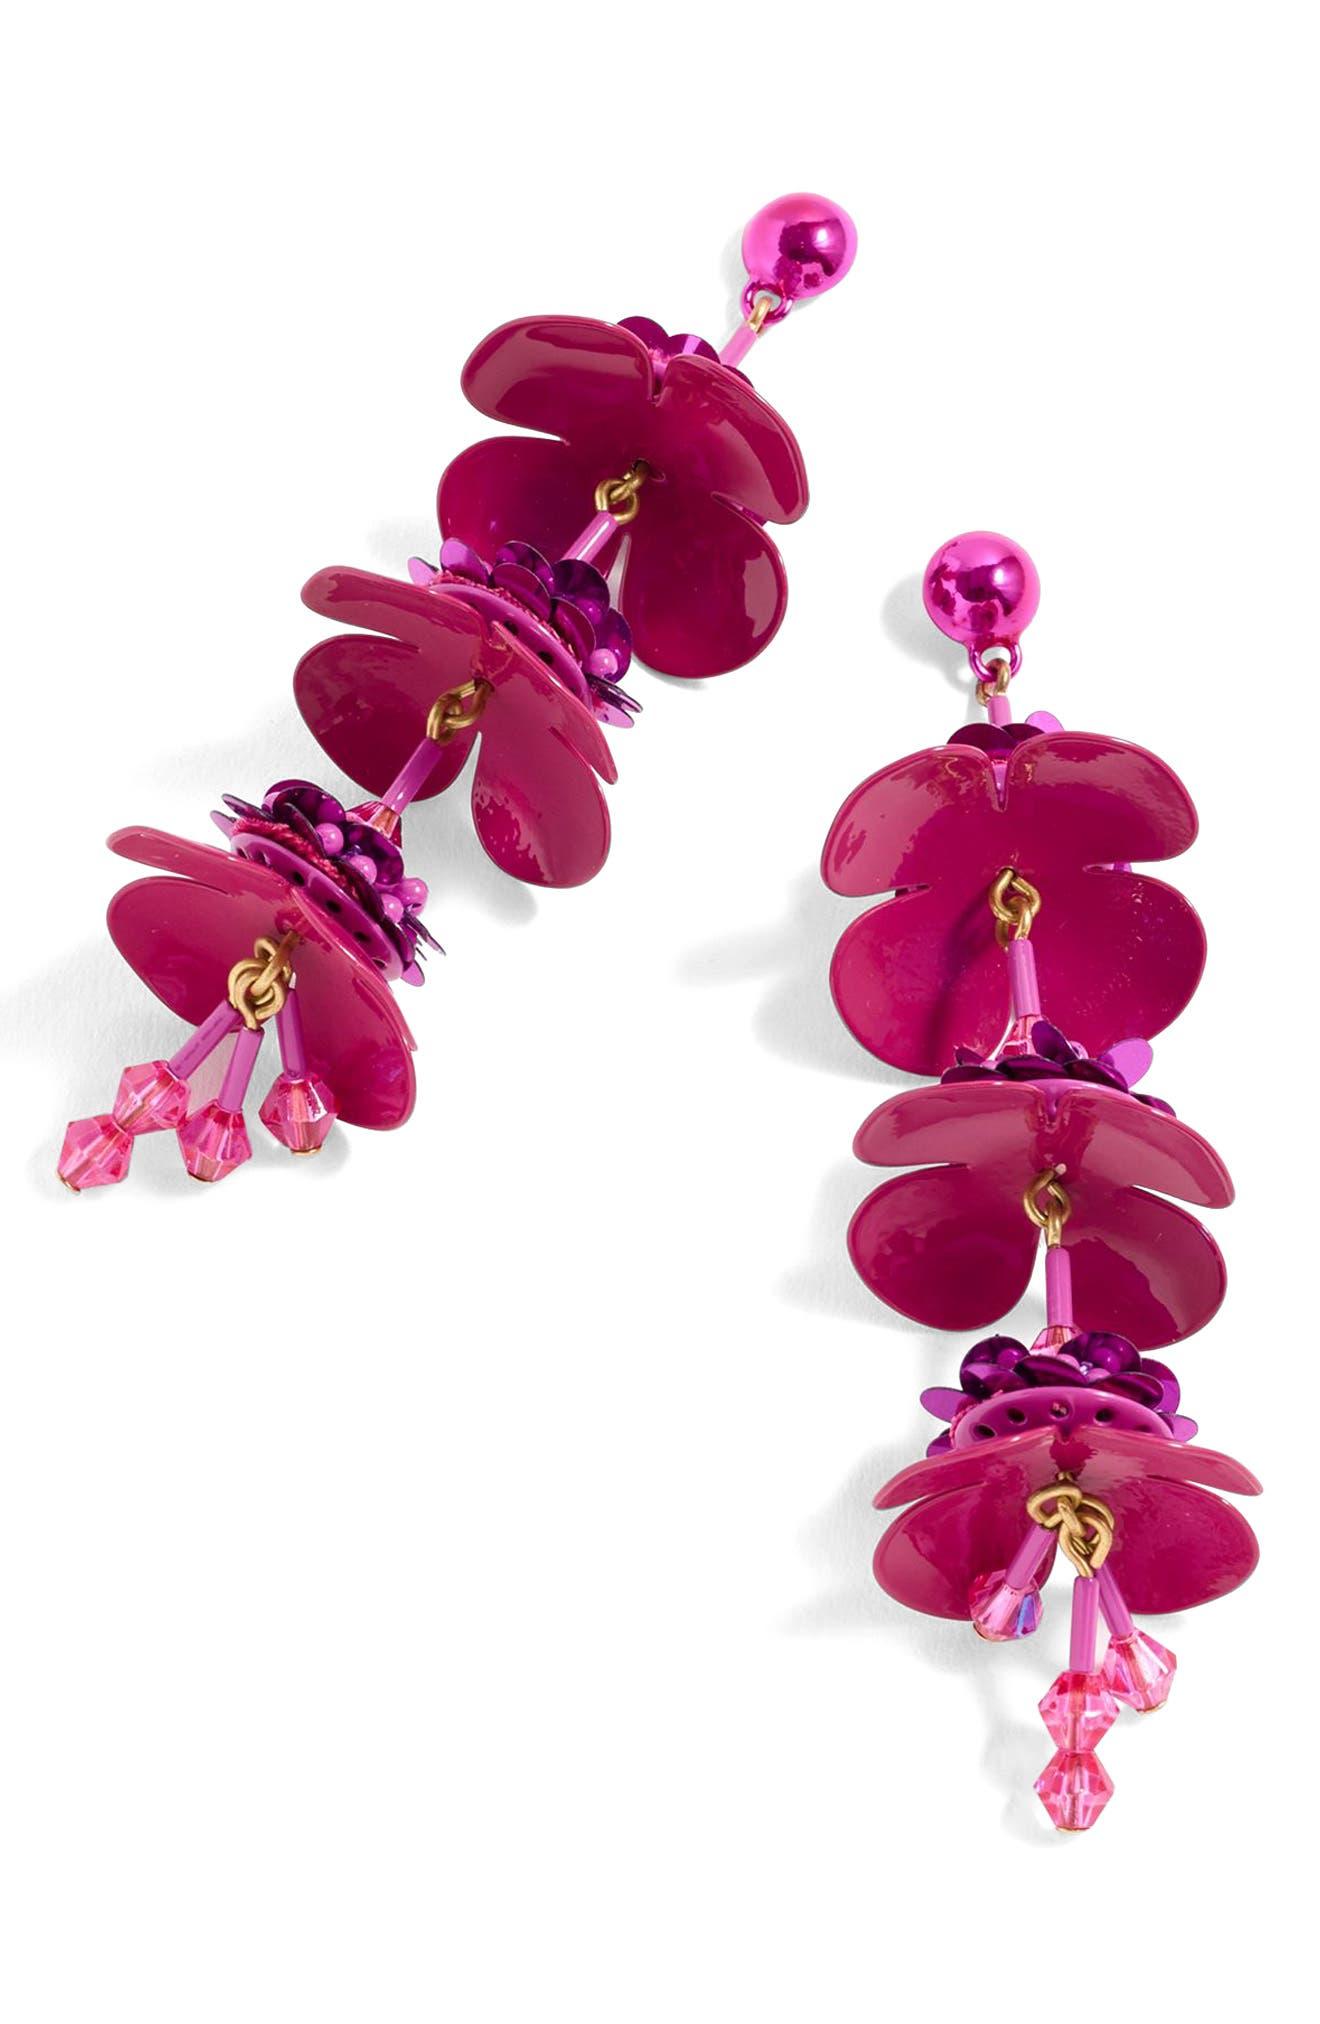 Bead & Blossom Earrings,                             Main thumbnail 1, color,                             Pink